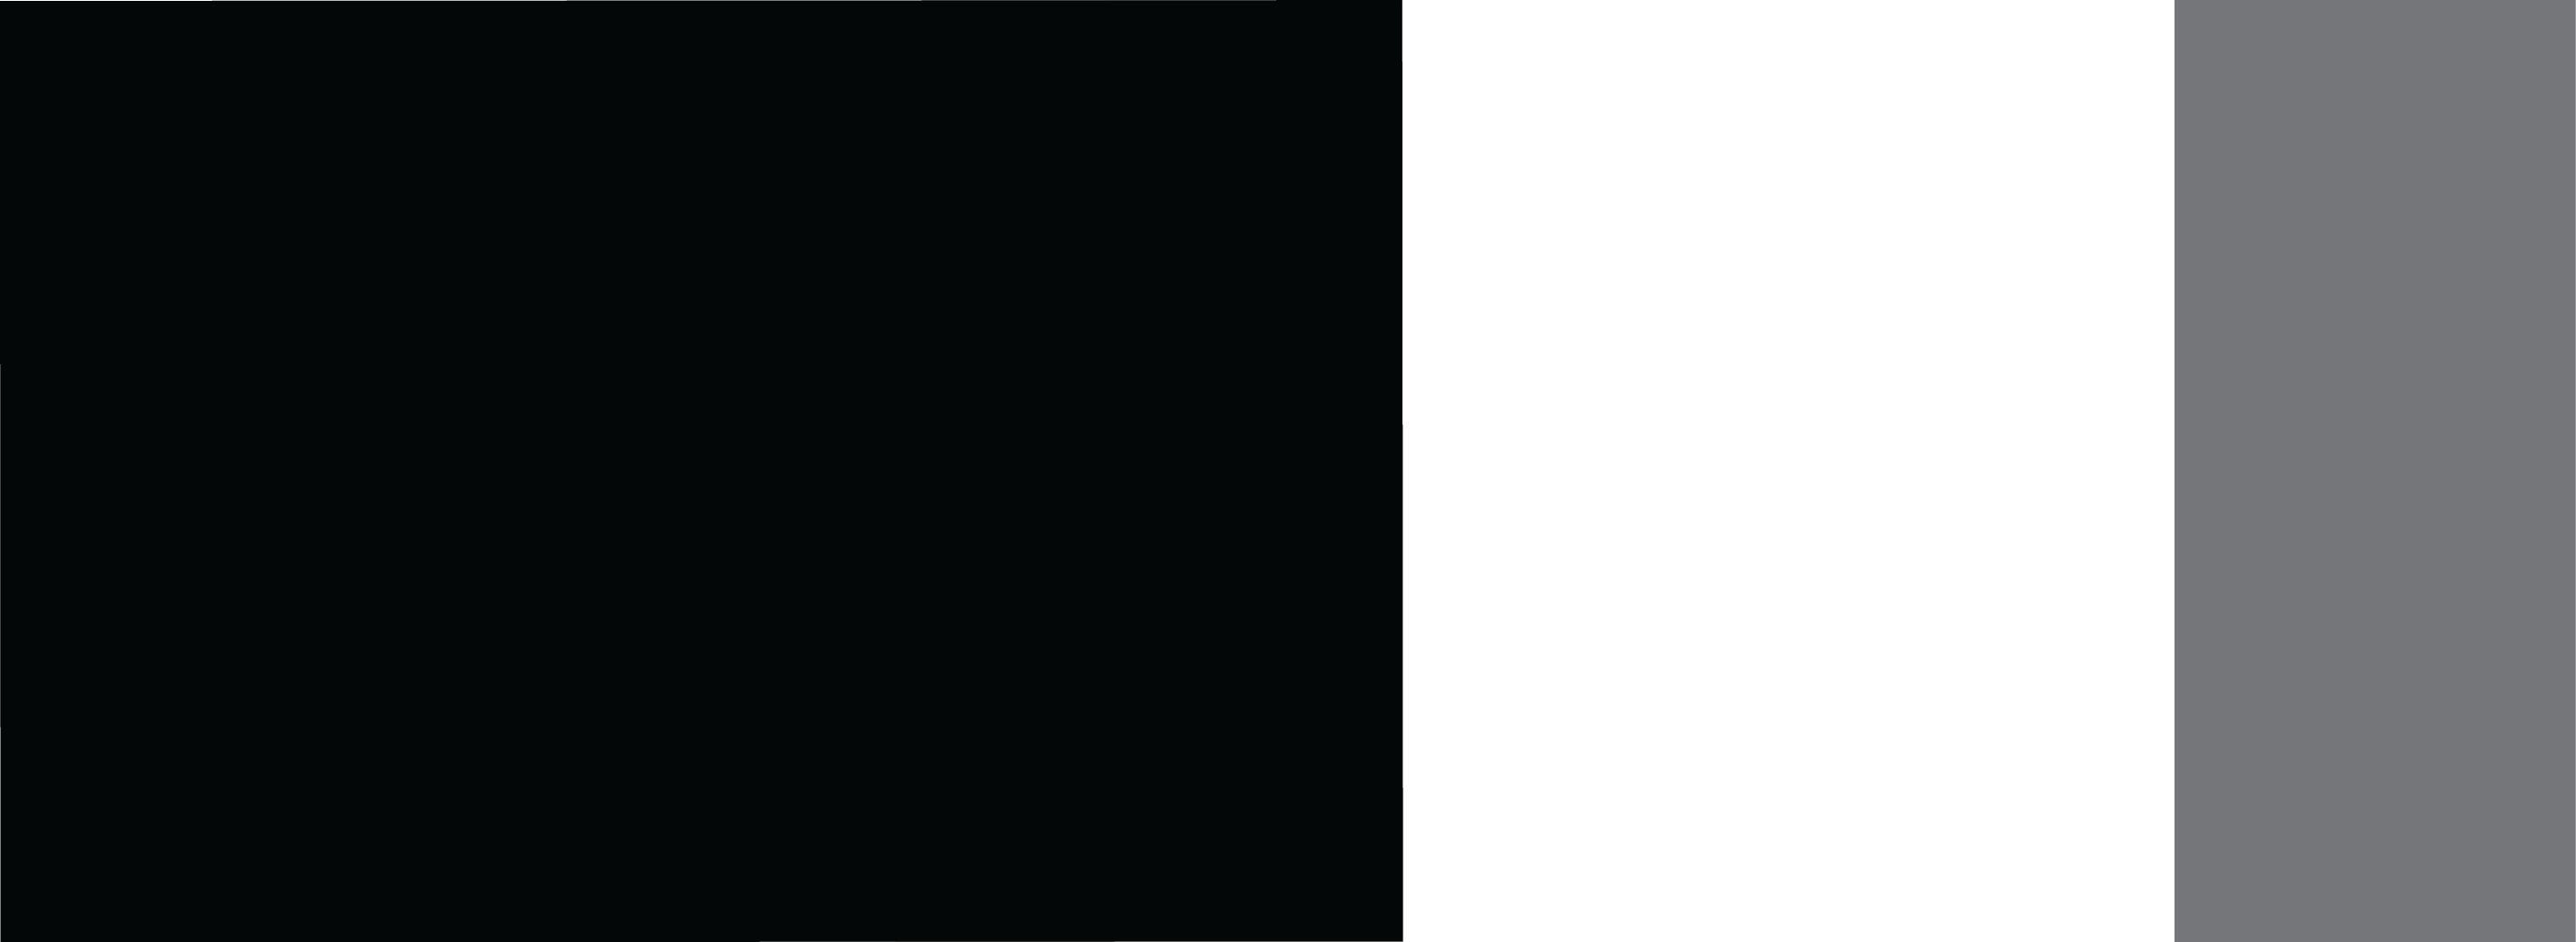 negru/alb/gri